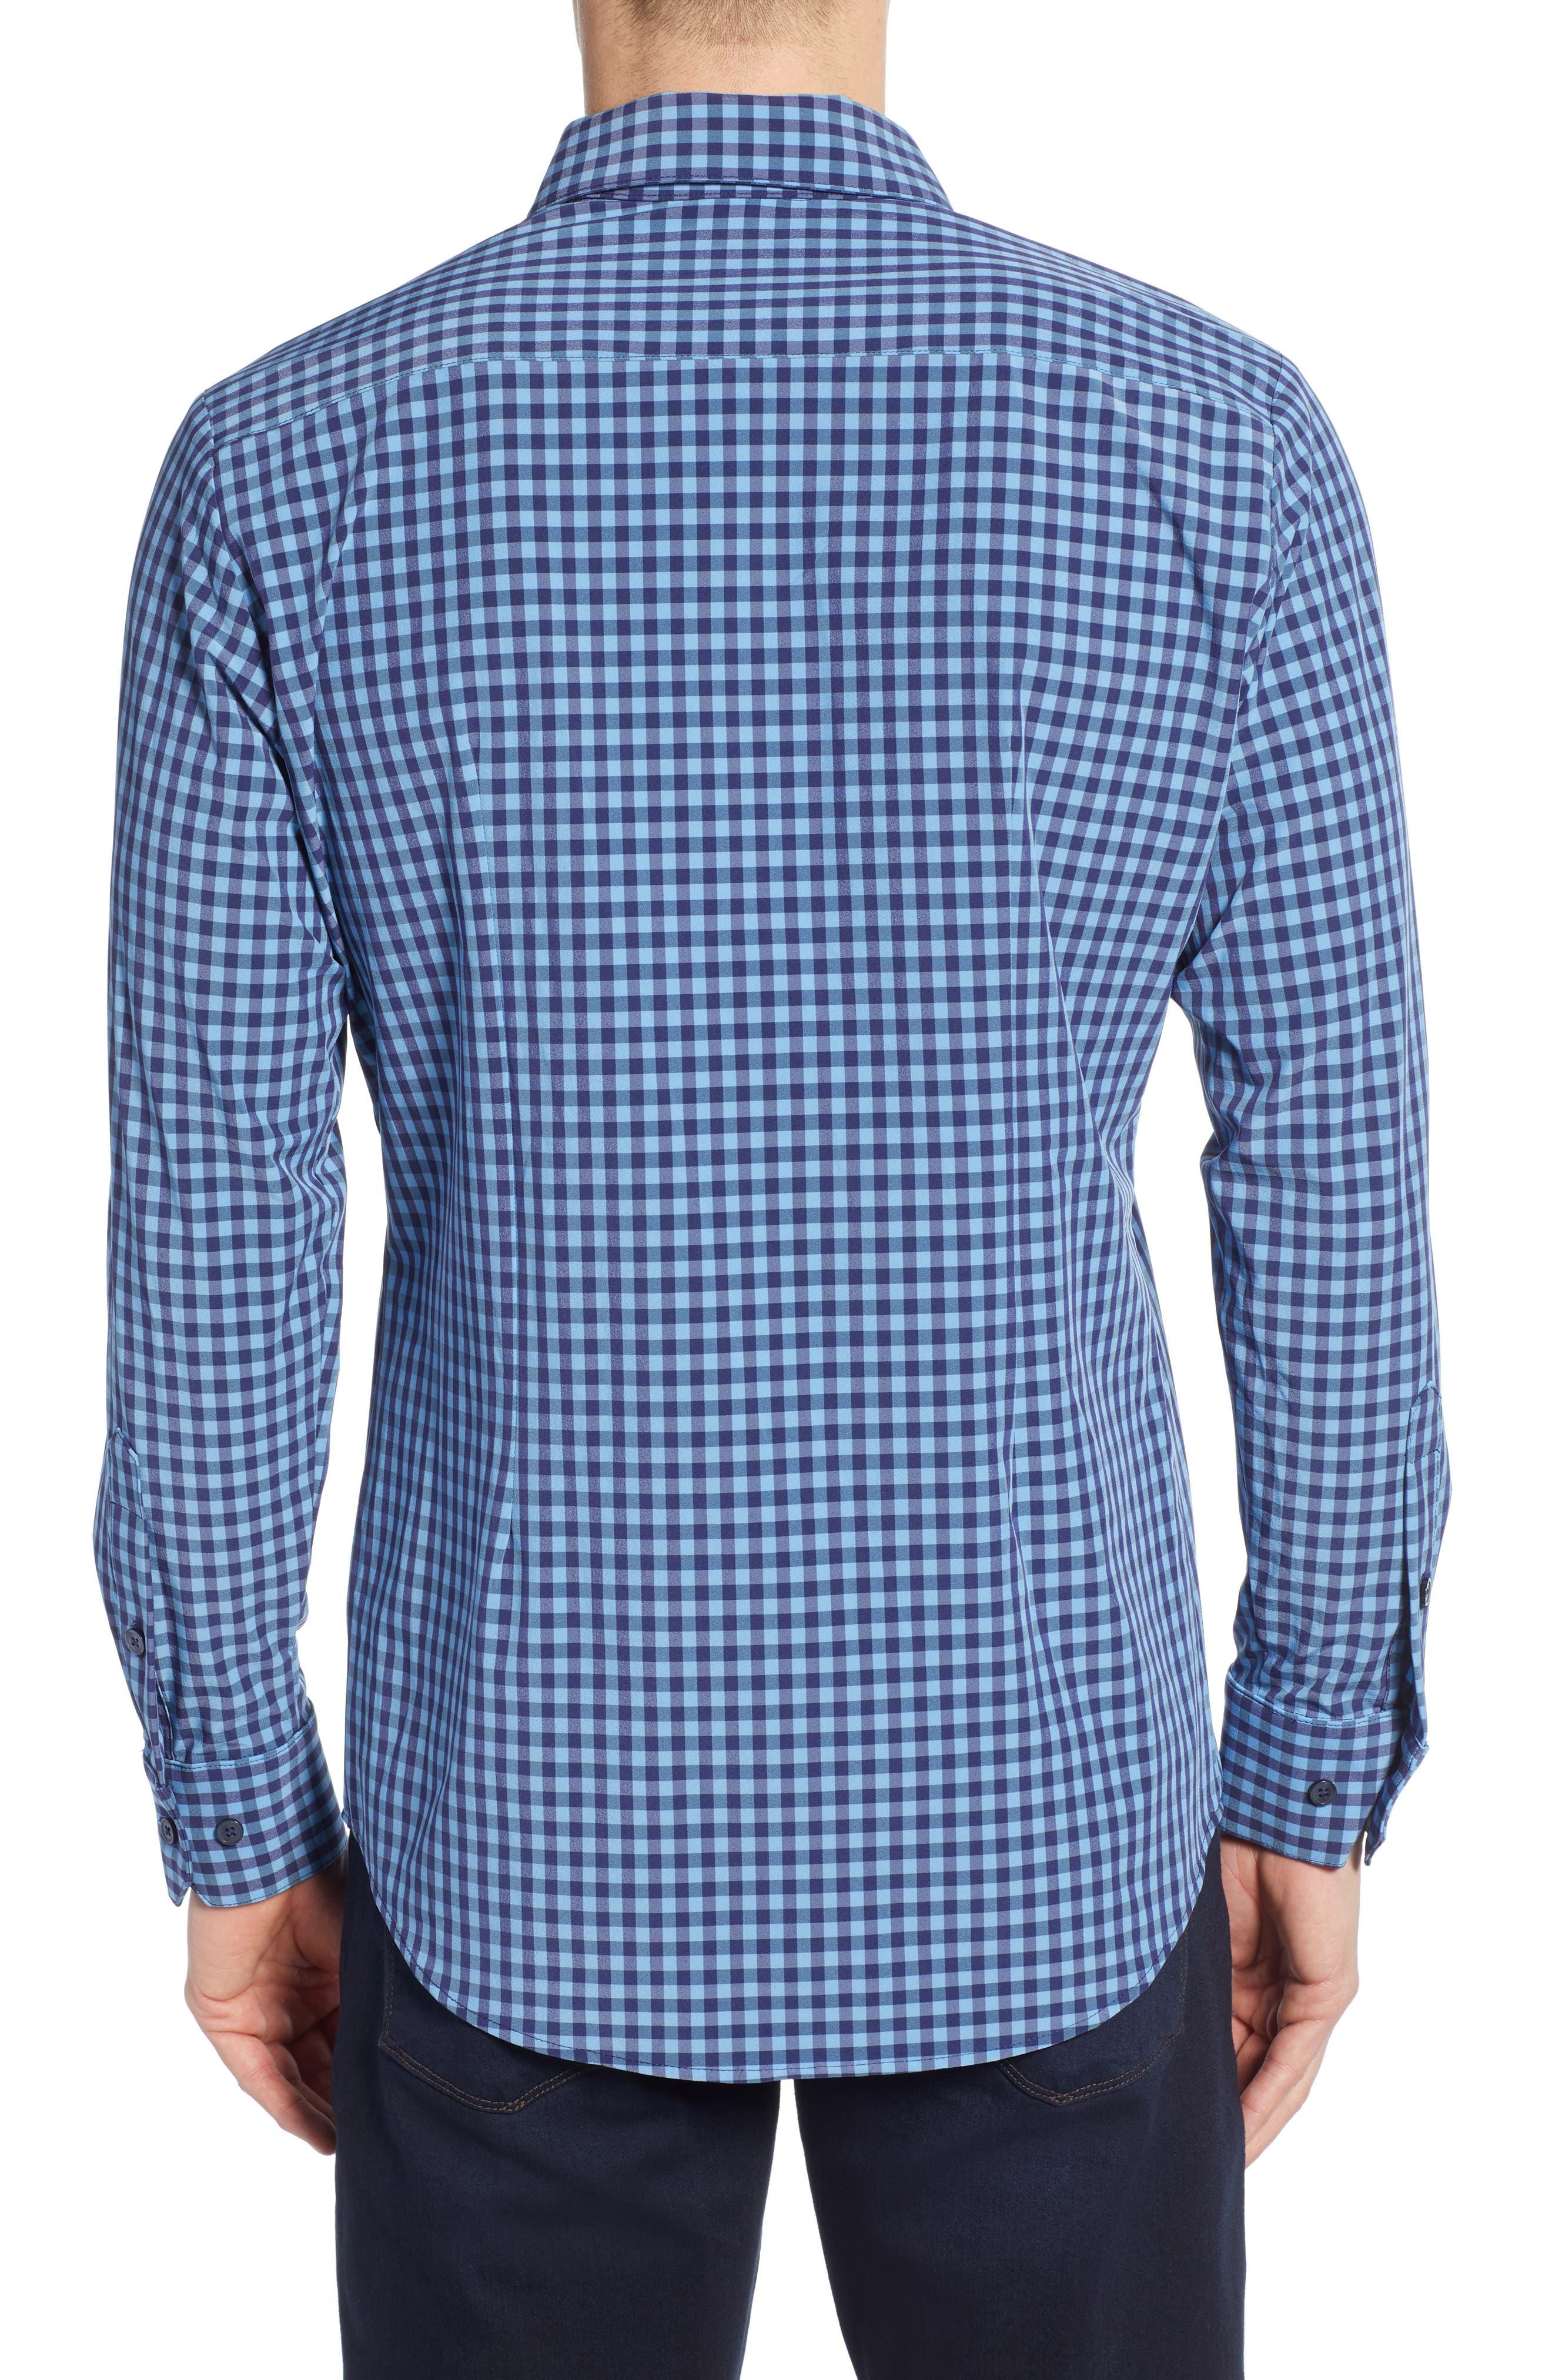 Whitten Regular Fit Check Performance Sport Shirt,                             Alternate thumbnail 3, color,                             BLUE